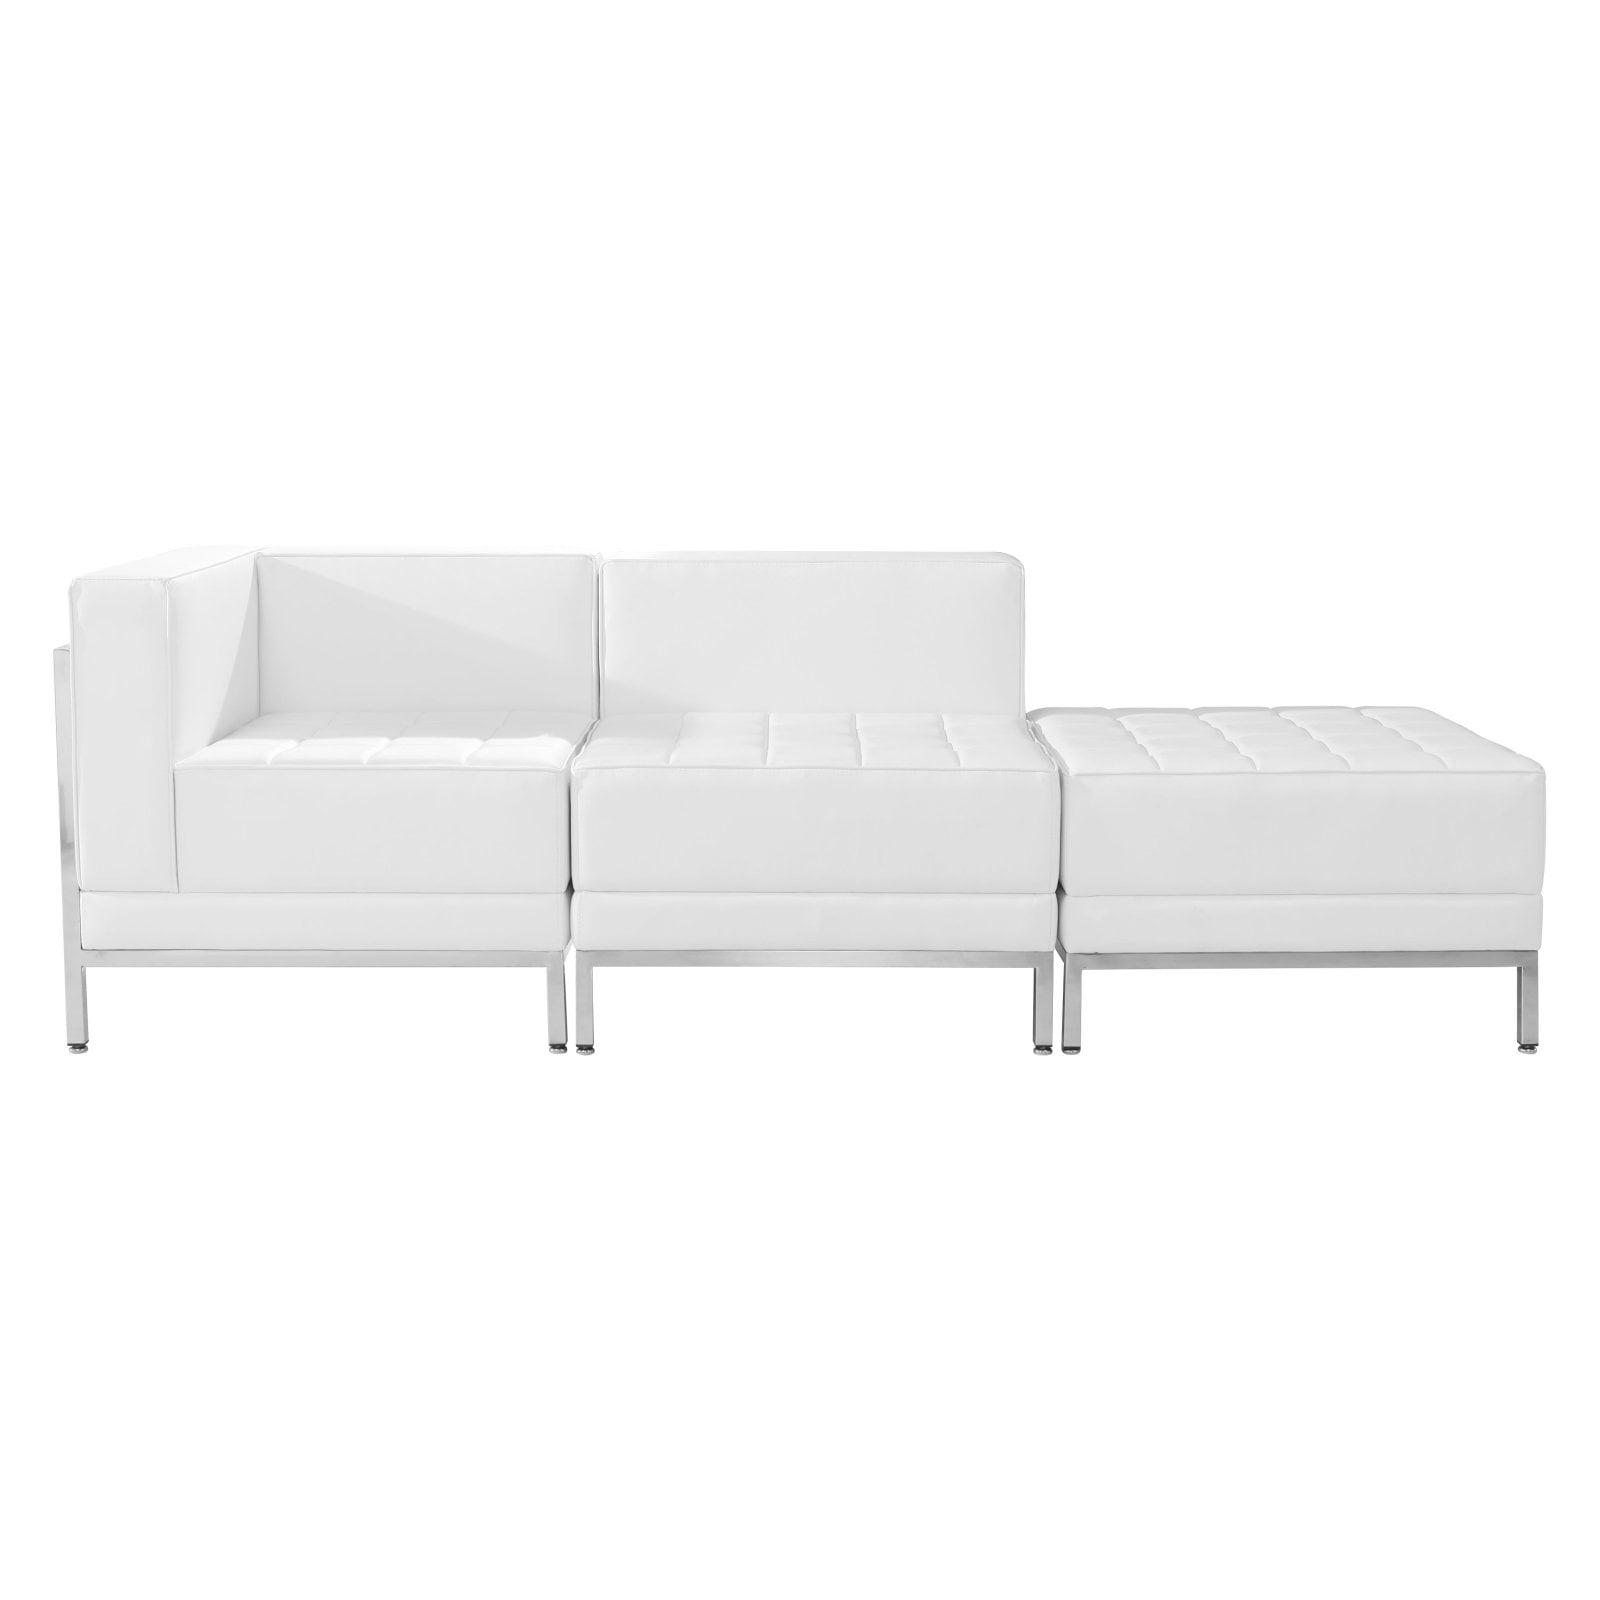 Flash Furniture Hercules IMagination Series 3 Piece Reception Chair Set by Flash Furniture